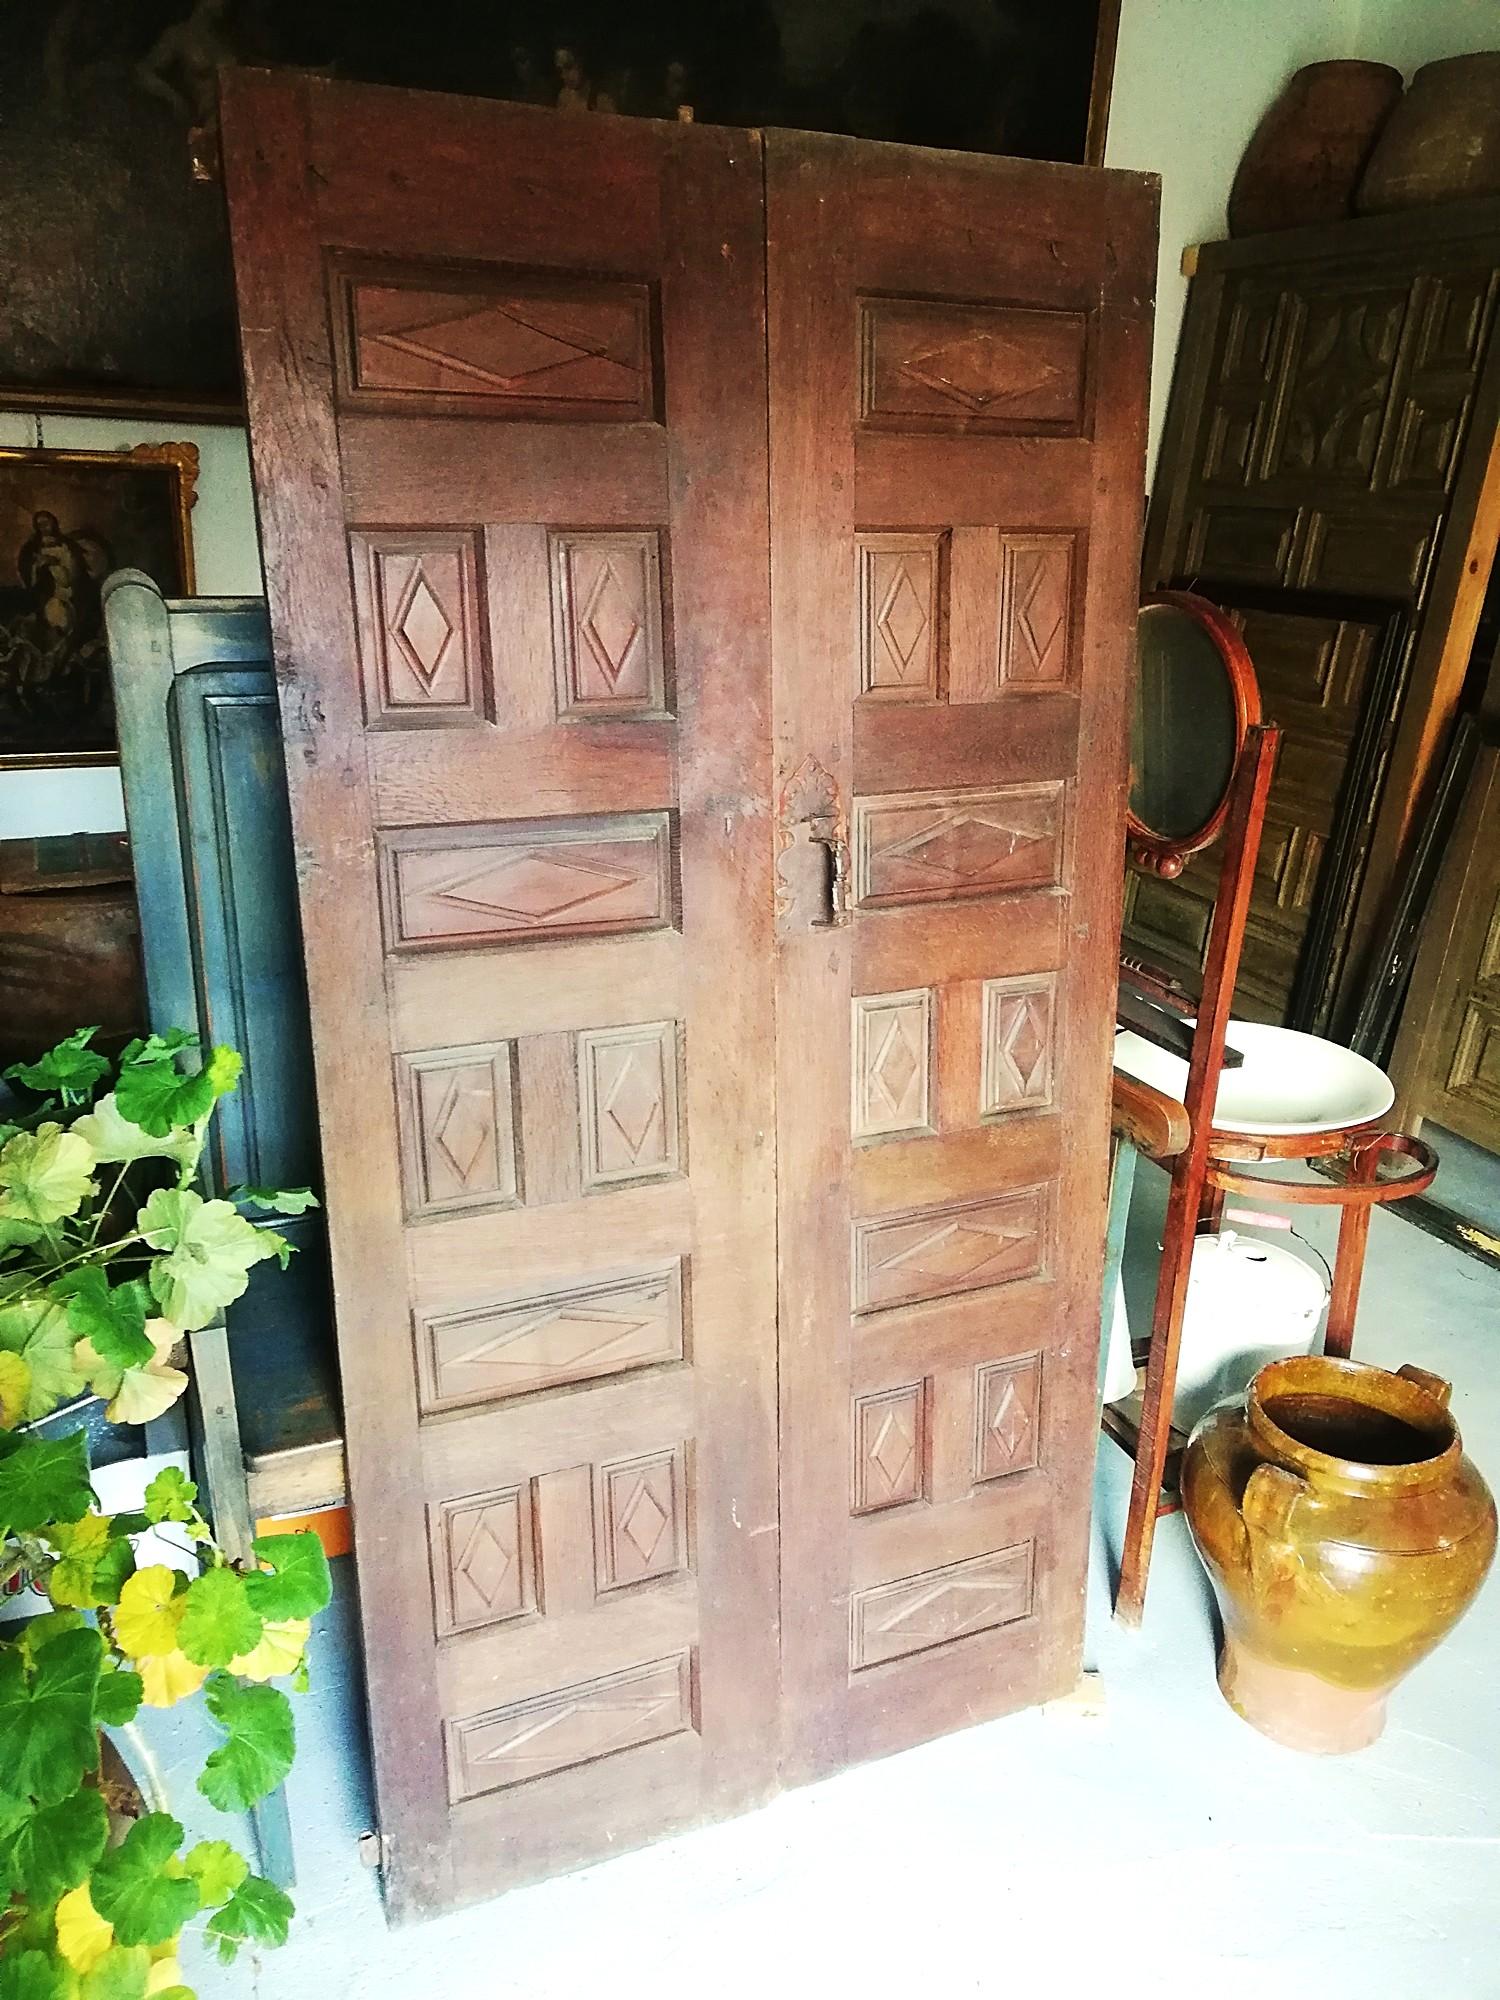 Puertas de derribo, puerta navarra